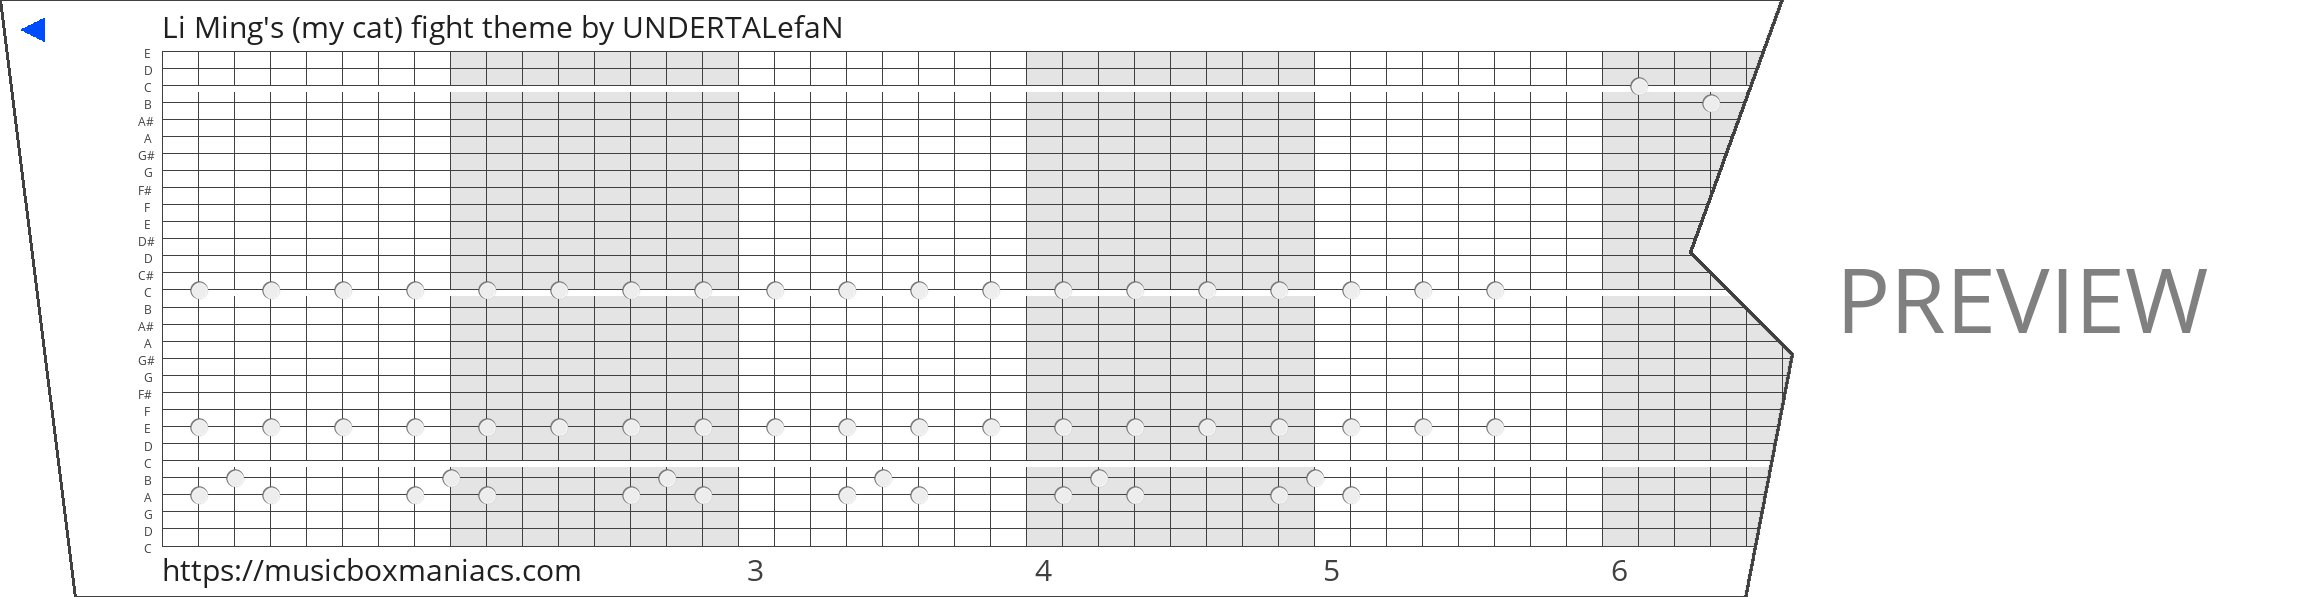 Li Ming's (my cat) fight theme 30 note music box paper strip